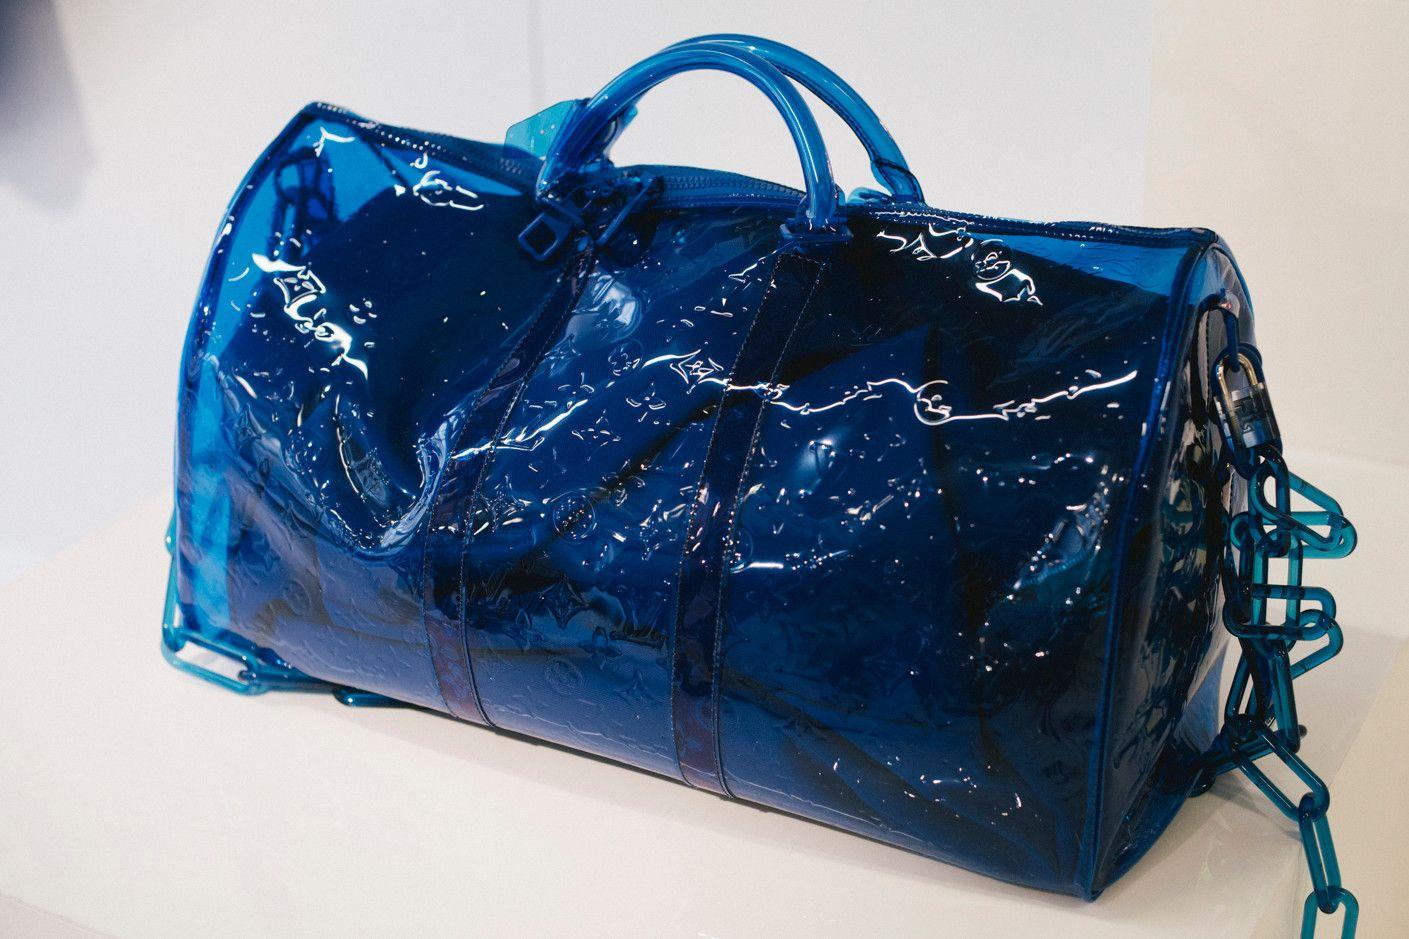 bbe7807bd172 Virgil Abloh Louis Vuitton Spring Summer 2019 Transparent Keepall Bag Blue